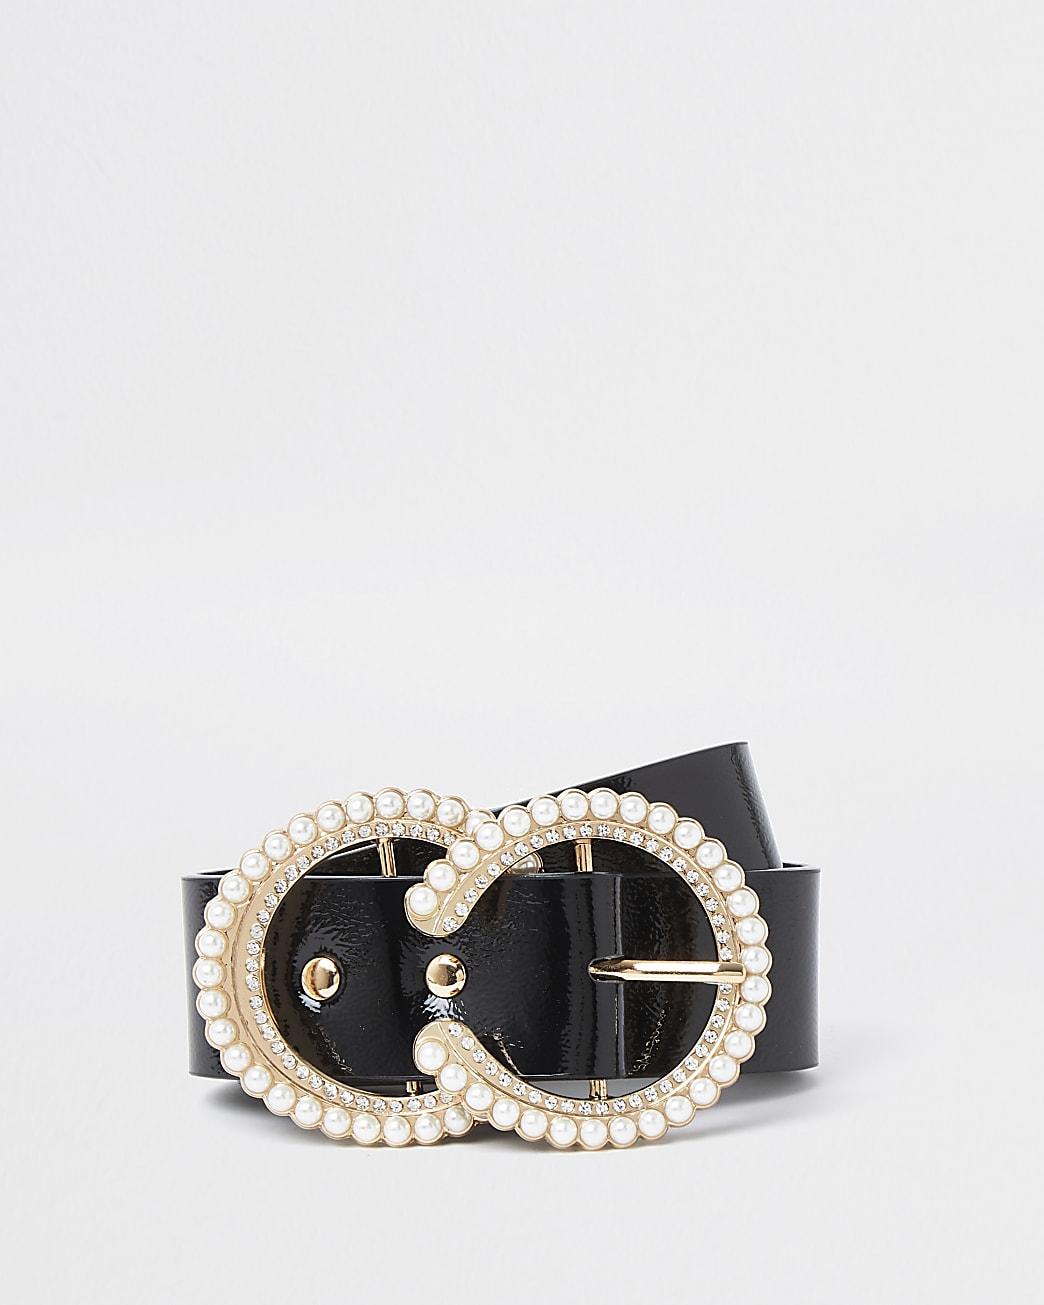 Black pearl and diamante buckle belt